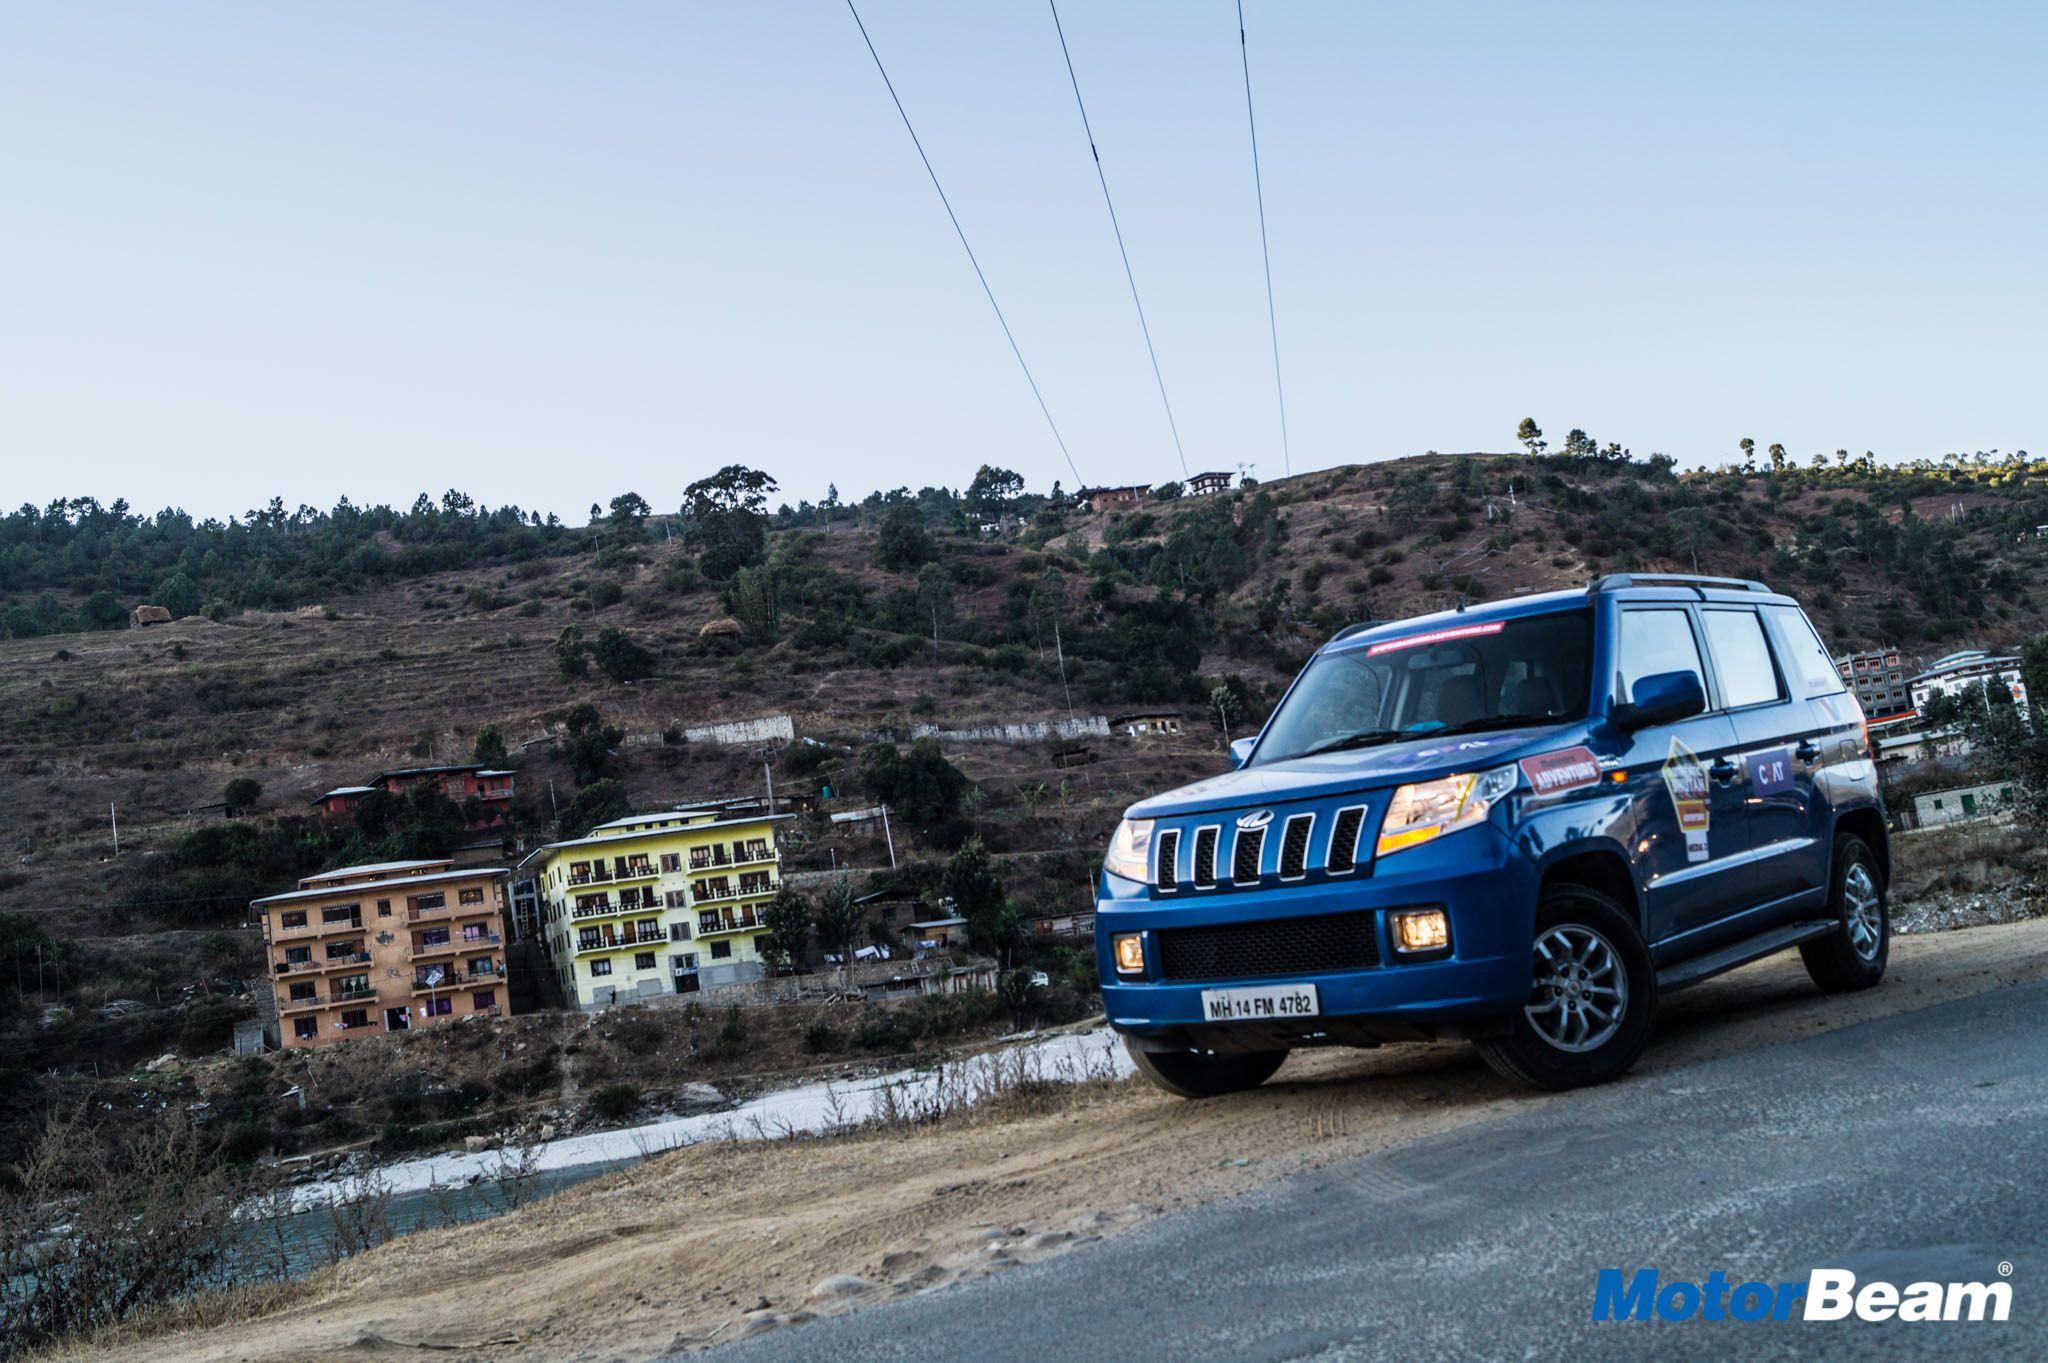 2017 Mahindra Authentic Bhutan In The Tuv300 Bhutan Authentic Thimphu